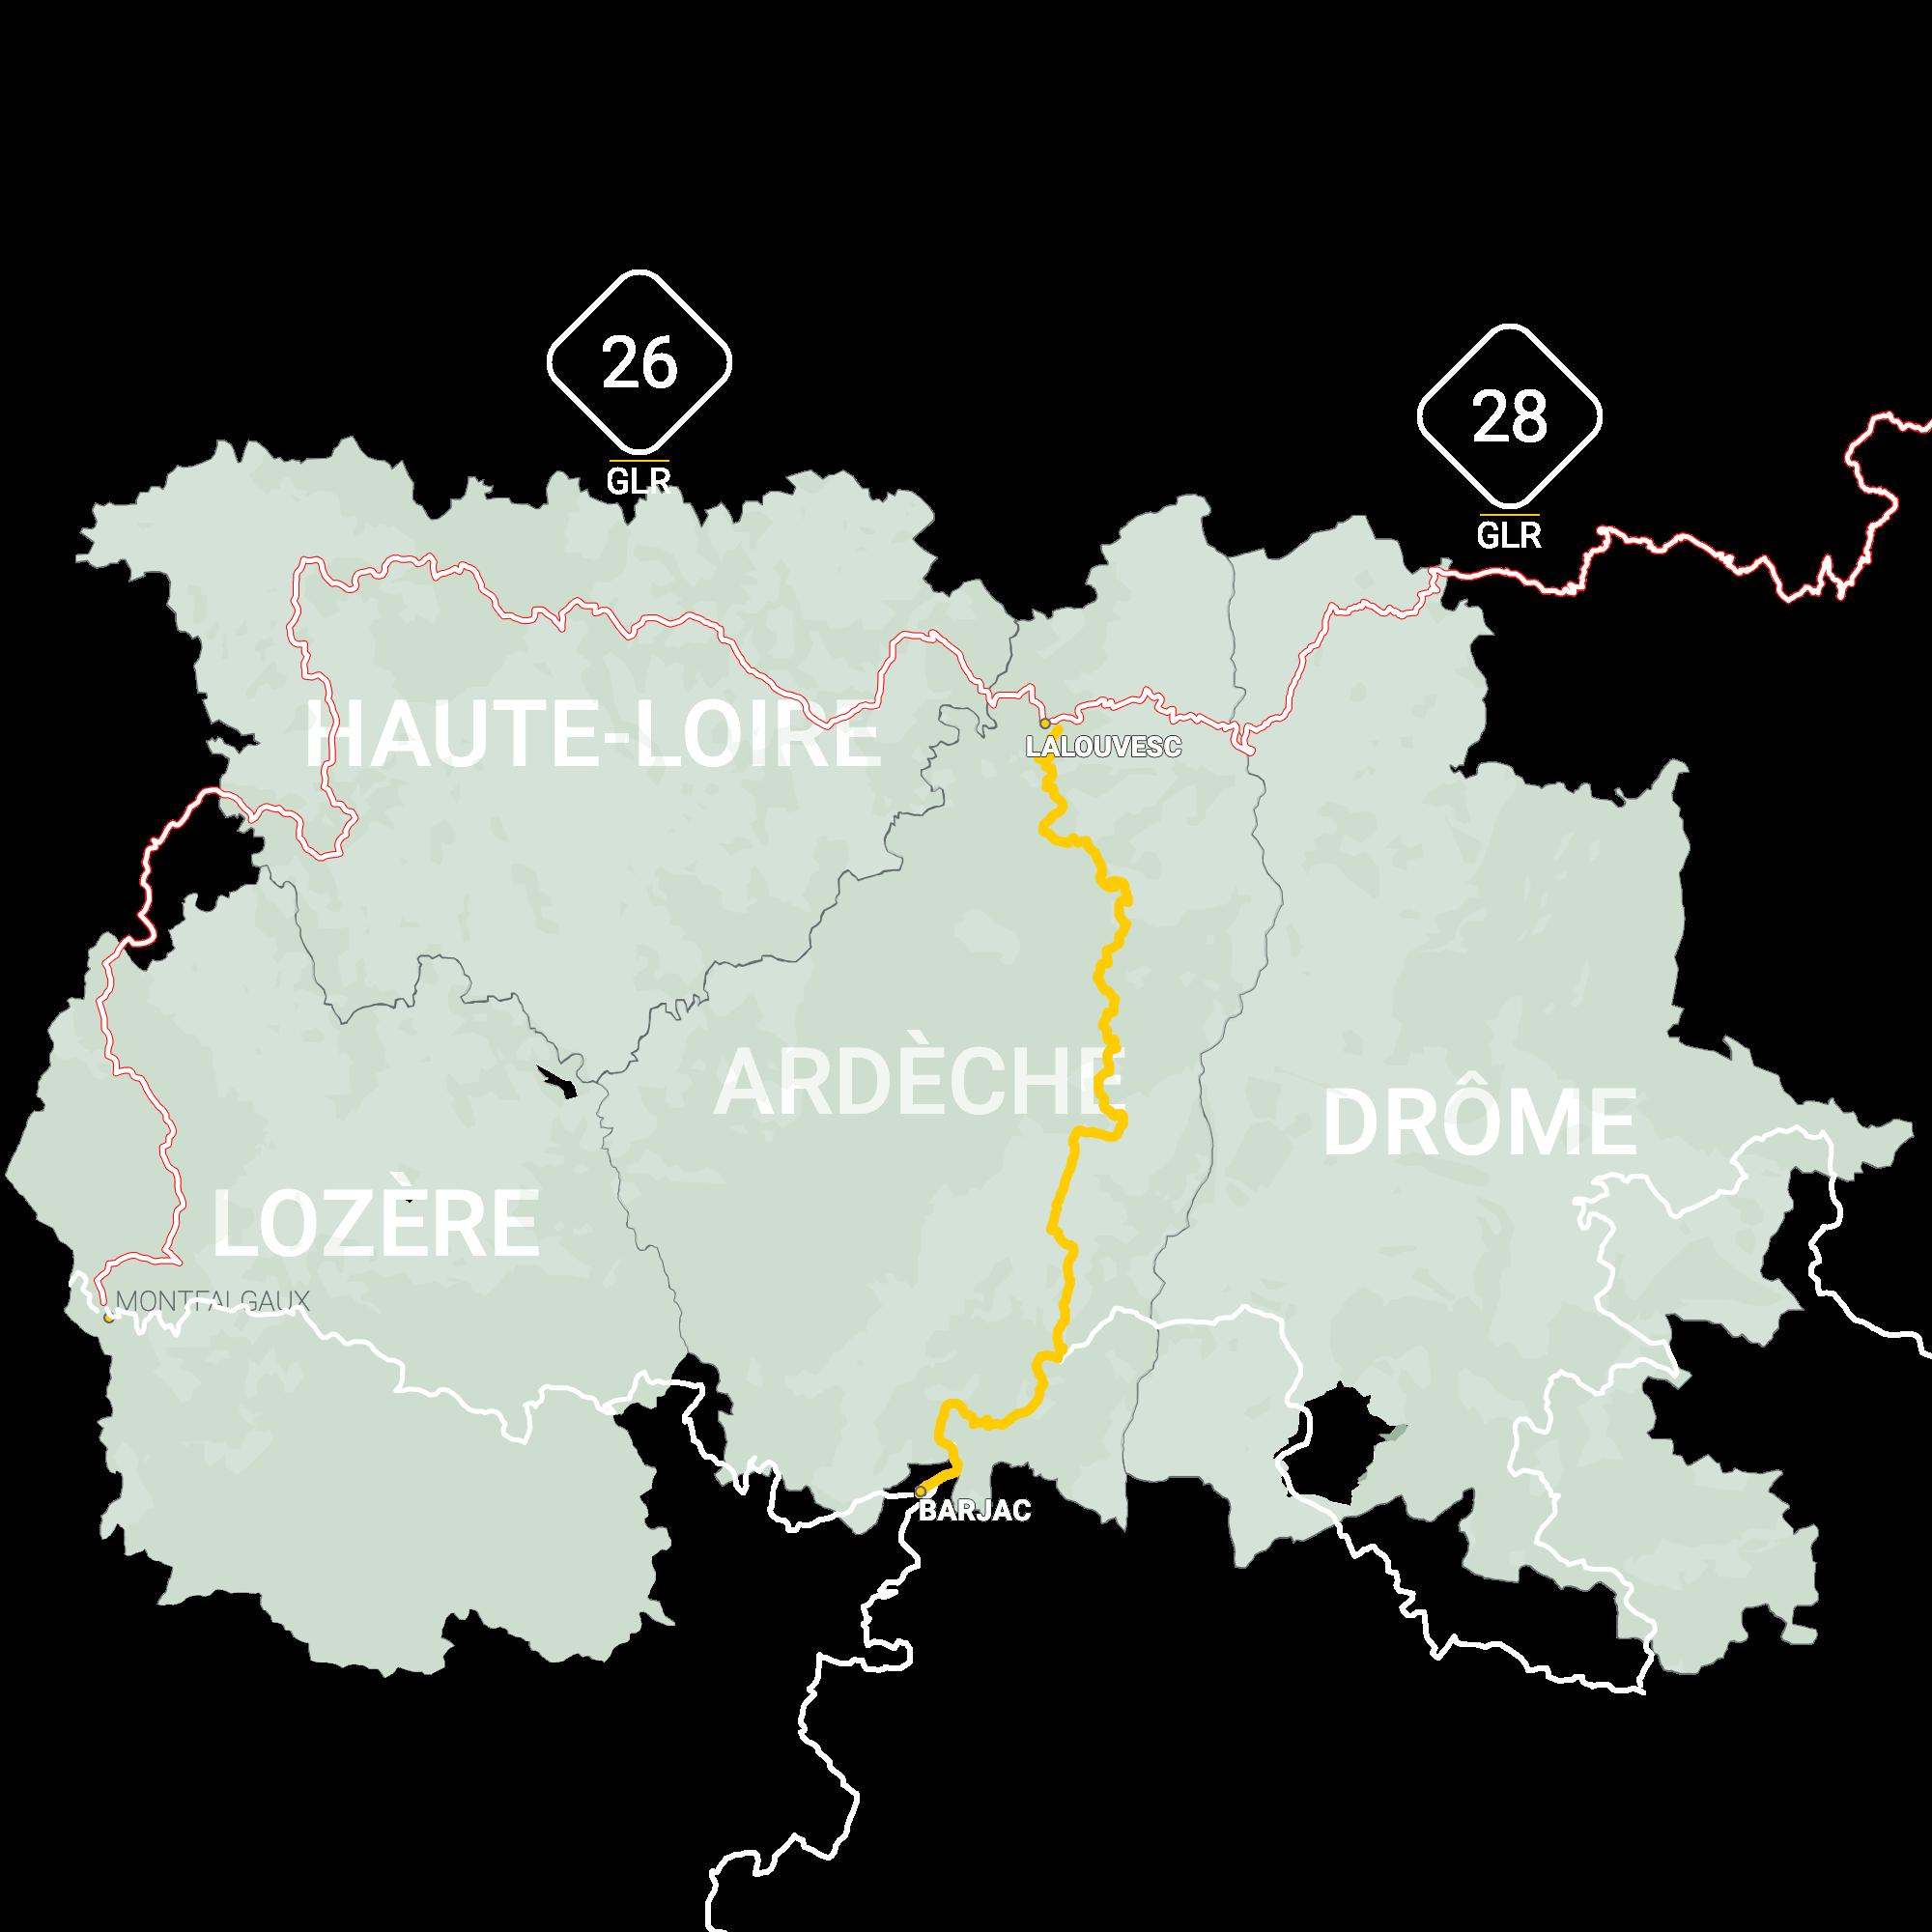 GLR 27 Connections Lalouvesc Overview